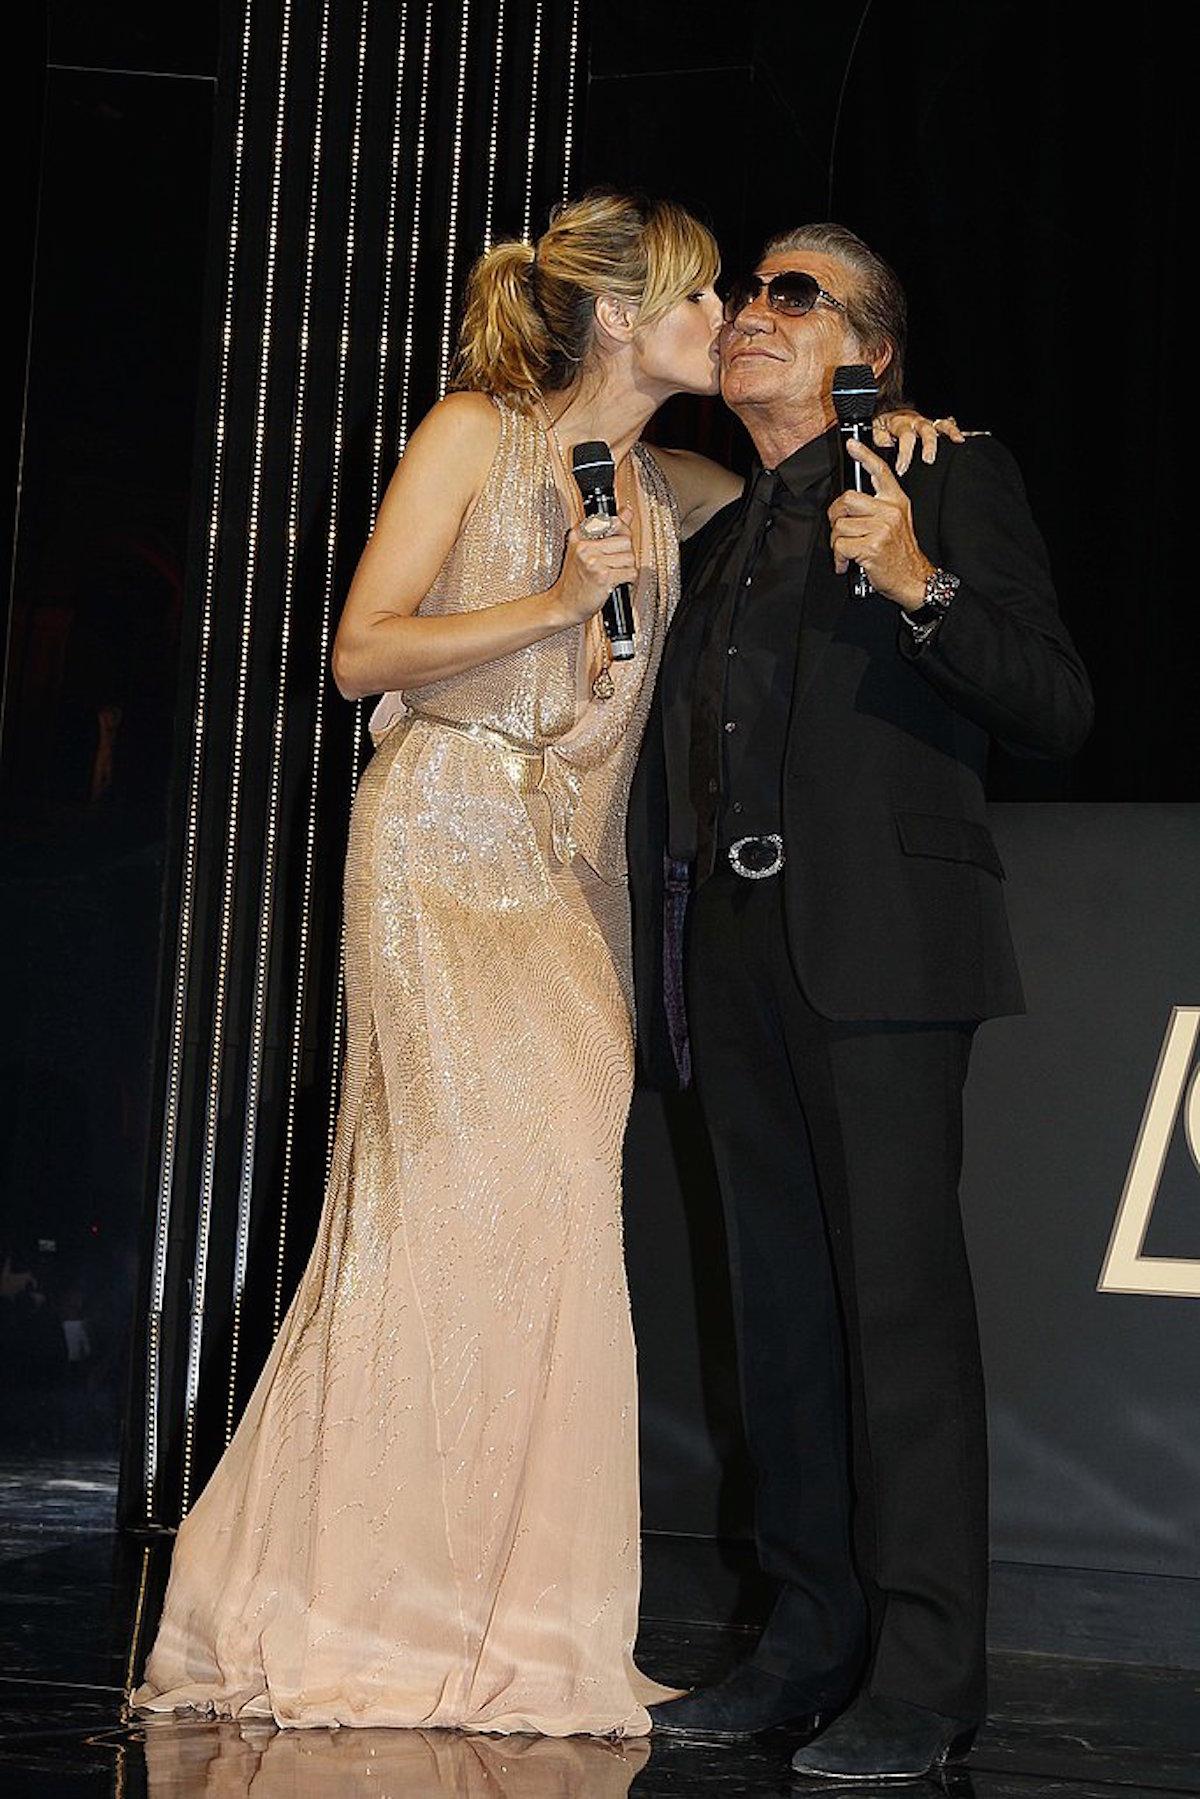 Heidi-Klum and Roberto-Cavalli